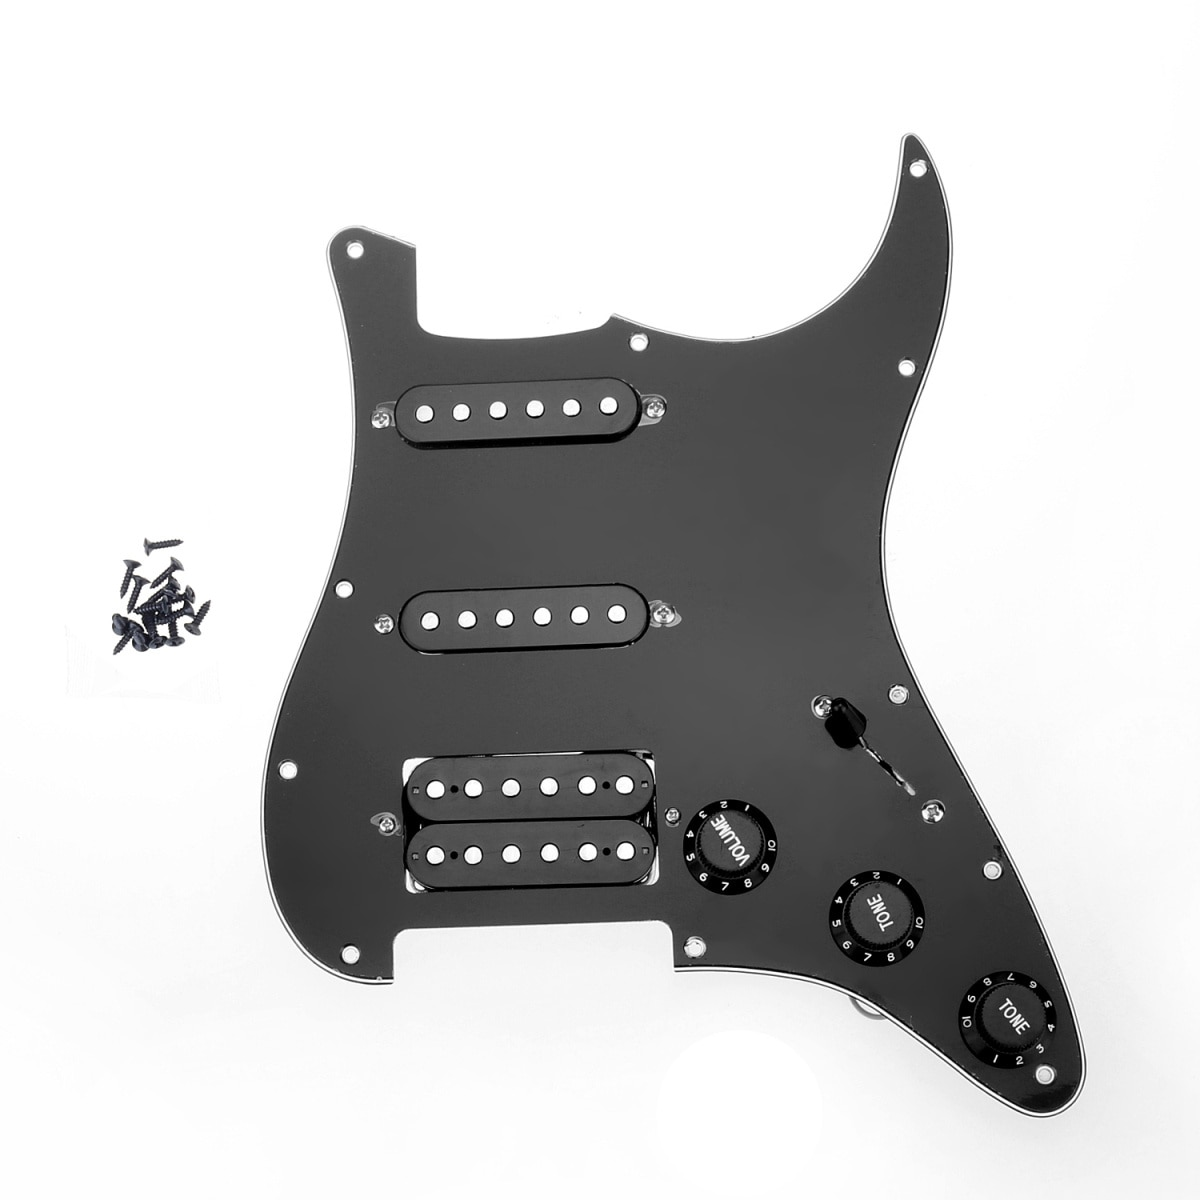 Muiclily-golpeador HSS con 11 orificios para guardabarros, conjunto de pastillas para guitarra...